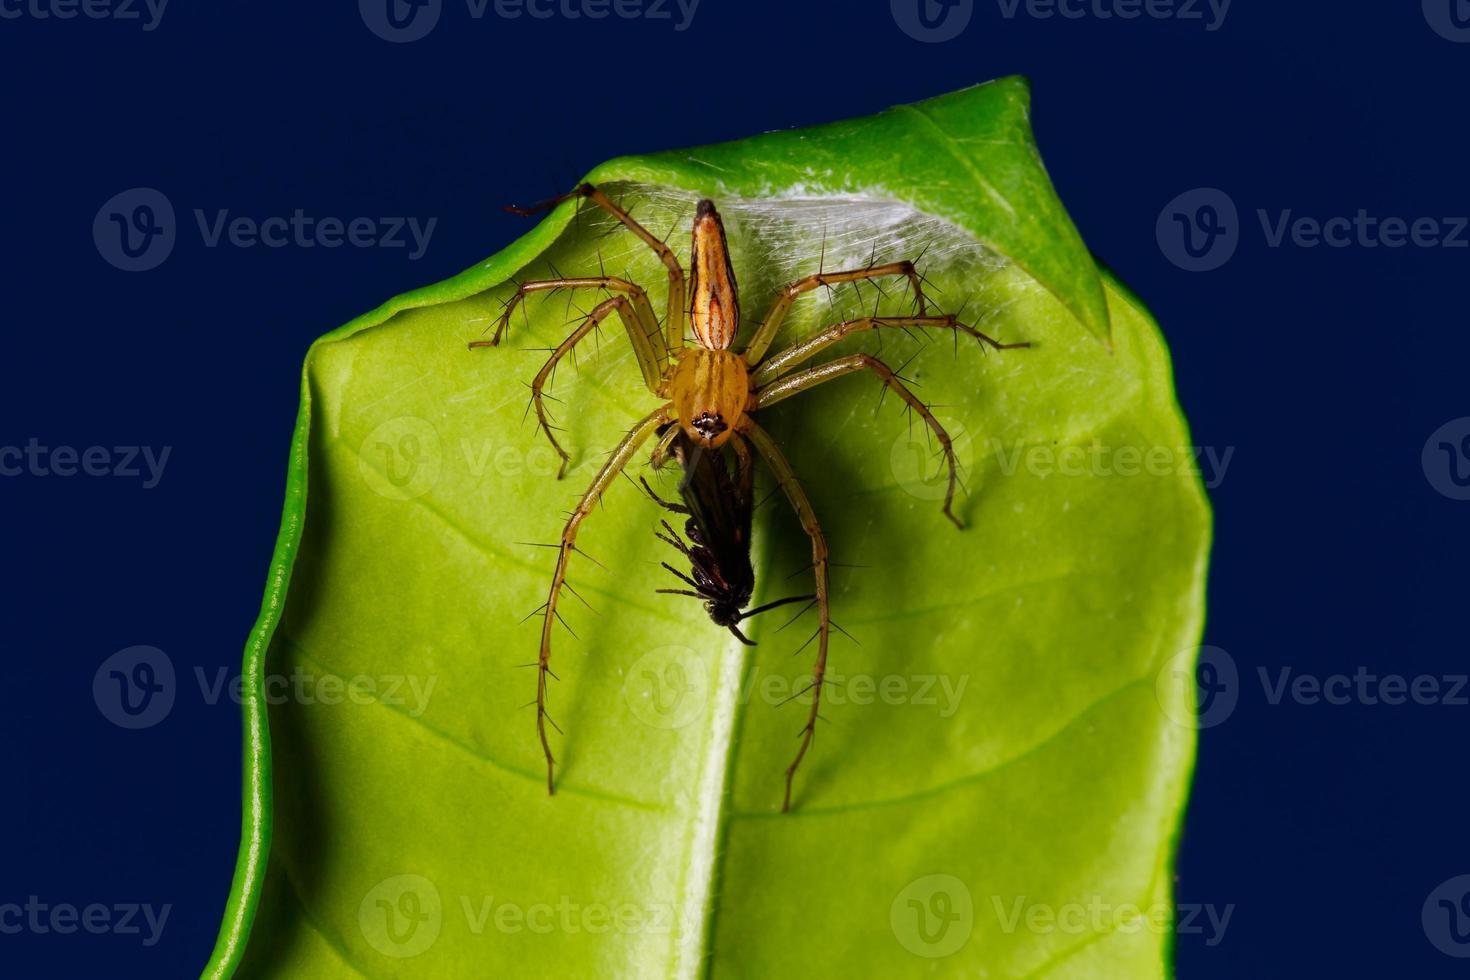 araña comiendo bicho en la hoja foto